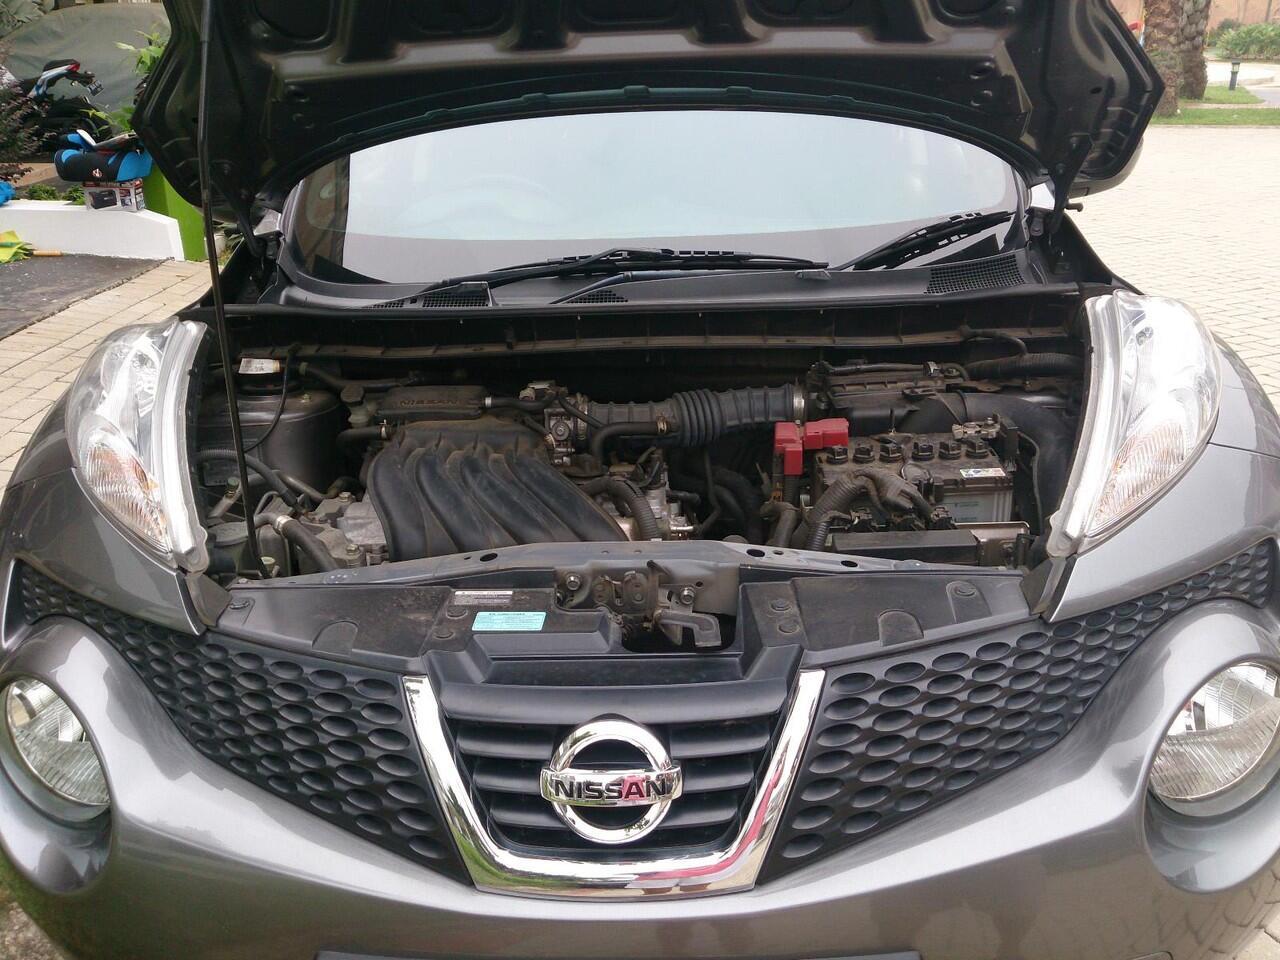 Nissan Juke Rx 2012 Abu-abu Metalik , Langsung Pemakai, Istimewa.